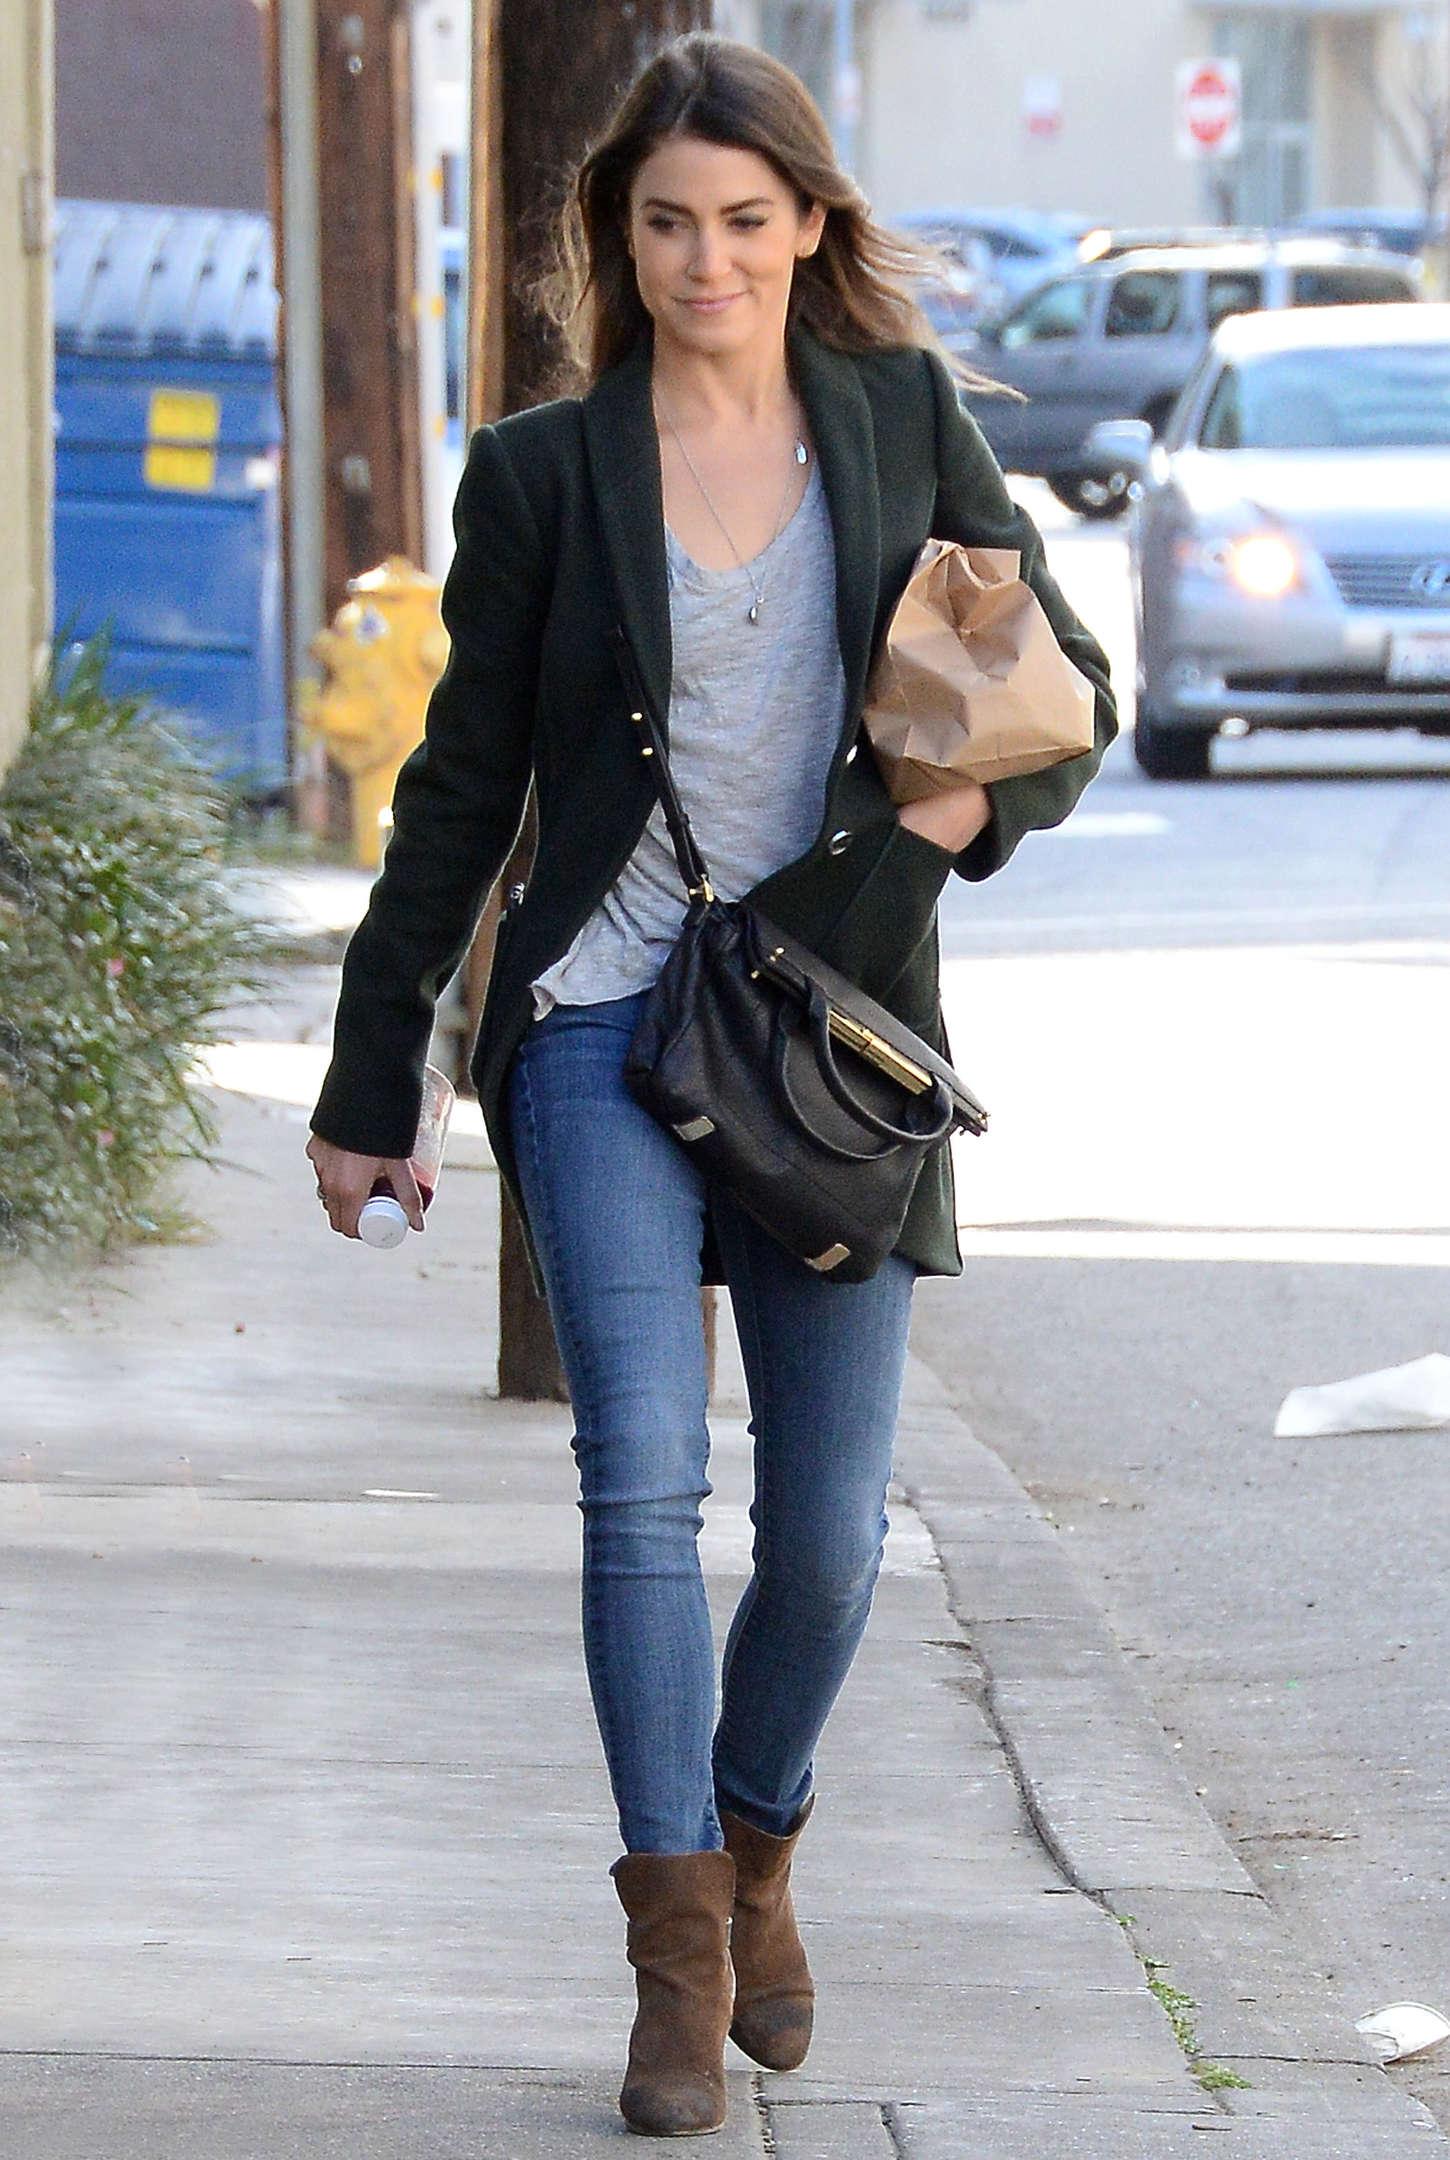 Nikki Reed in Jeans -29 - GotCeleb